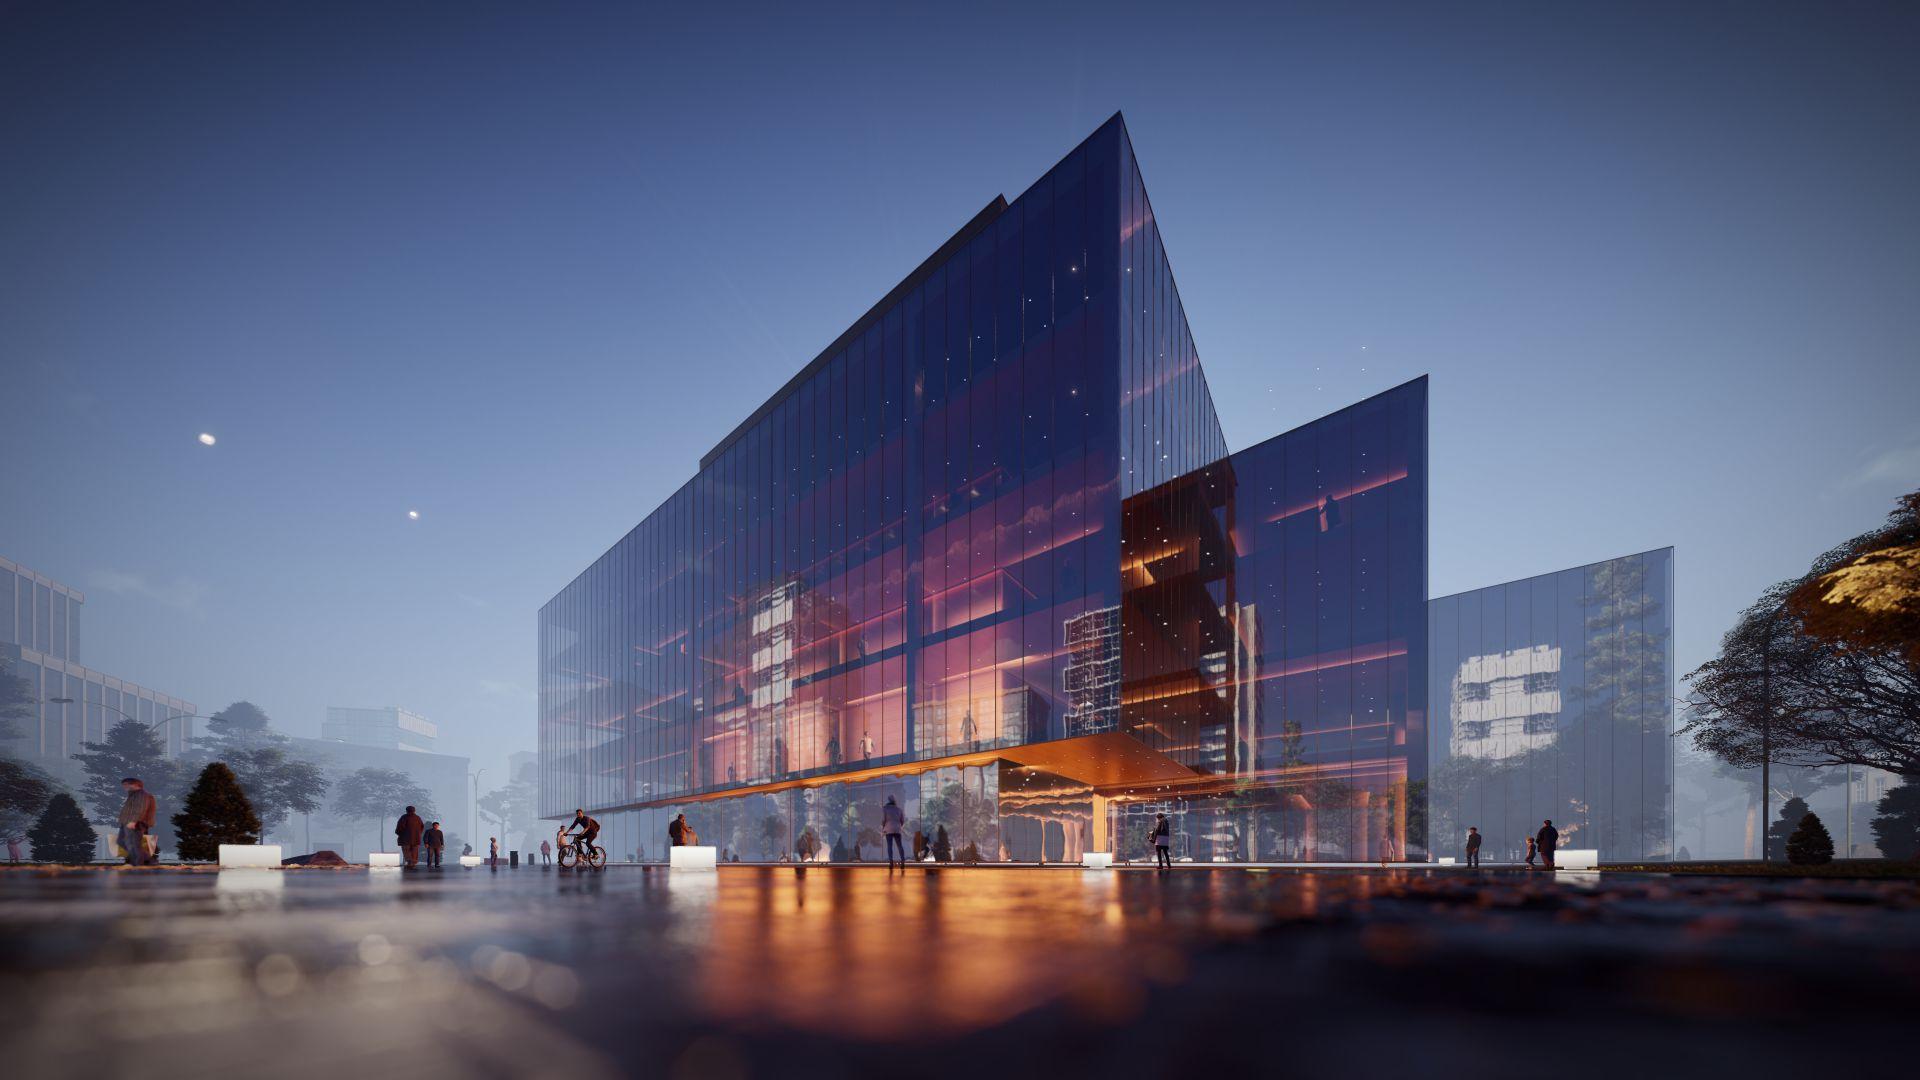 3d visualiseerimine hoone moderne keskplats hero sharp 4